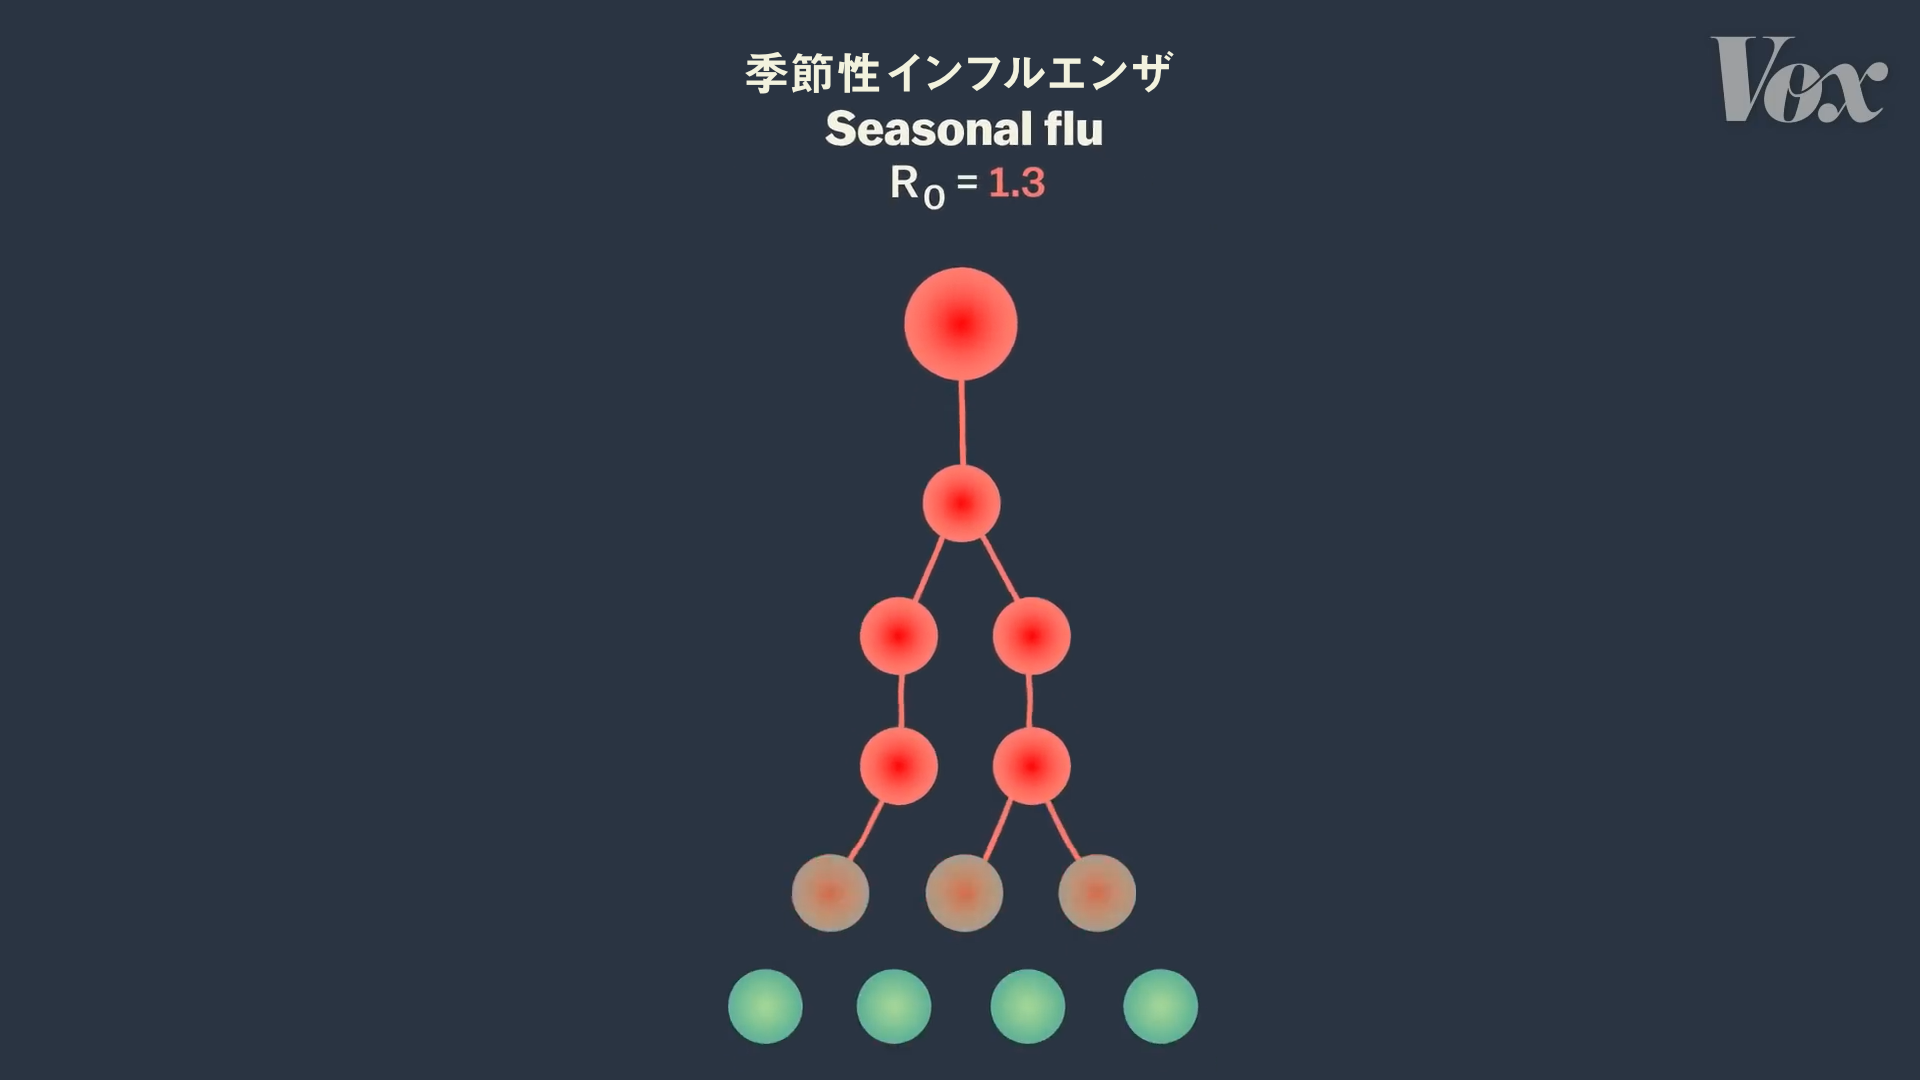 f:id:Imamura:20200408133140p:plain